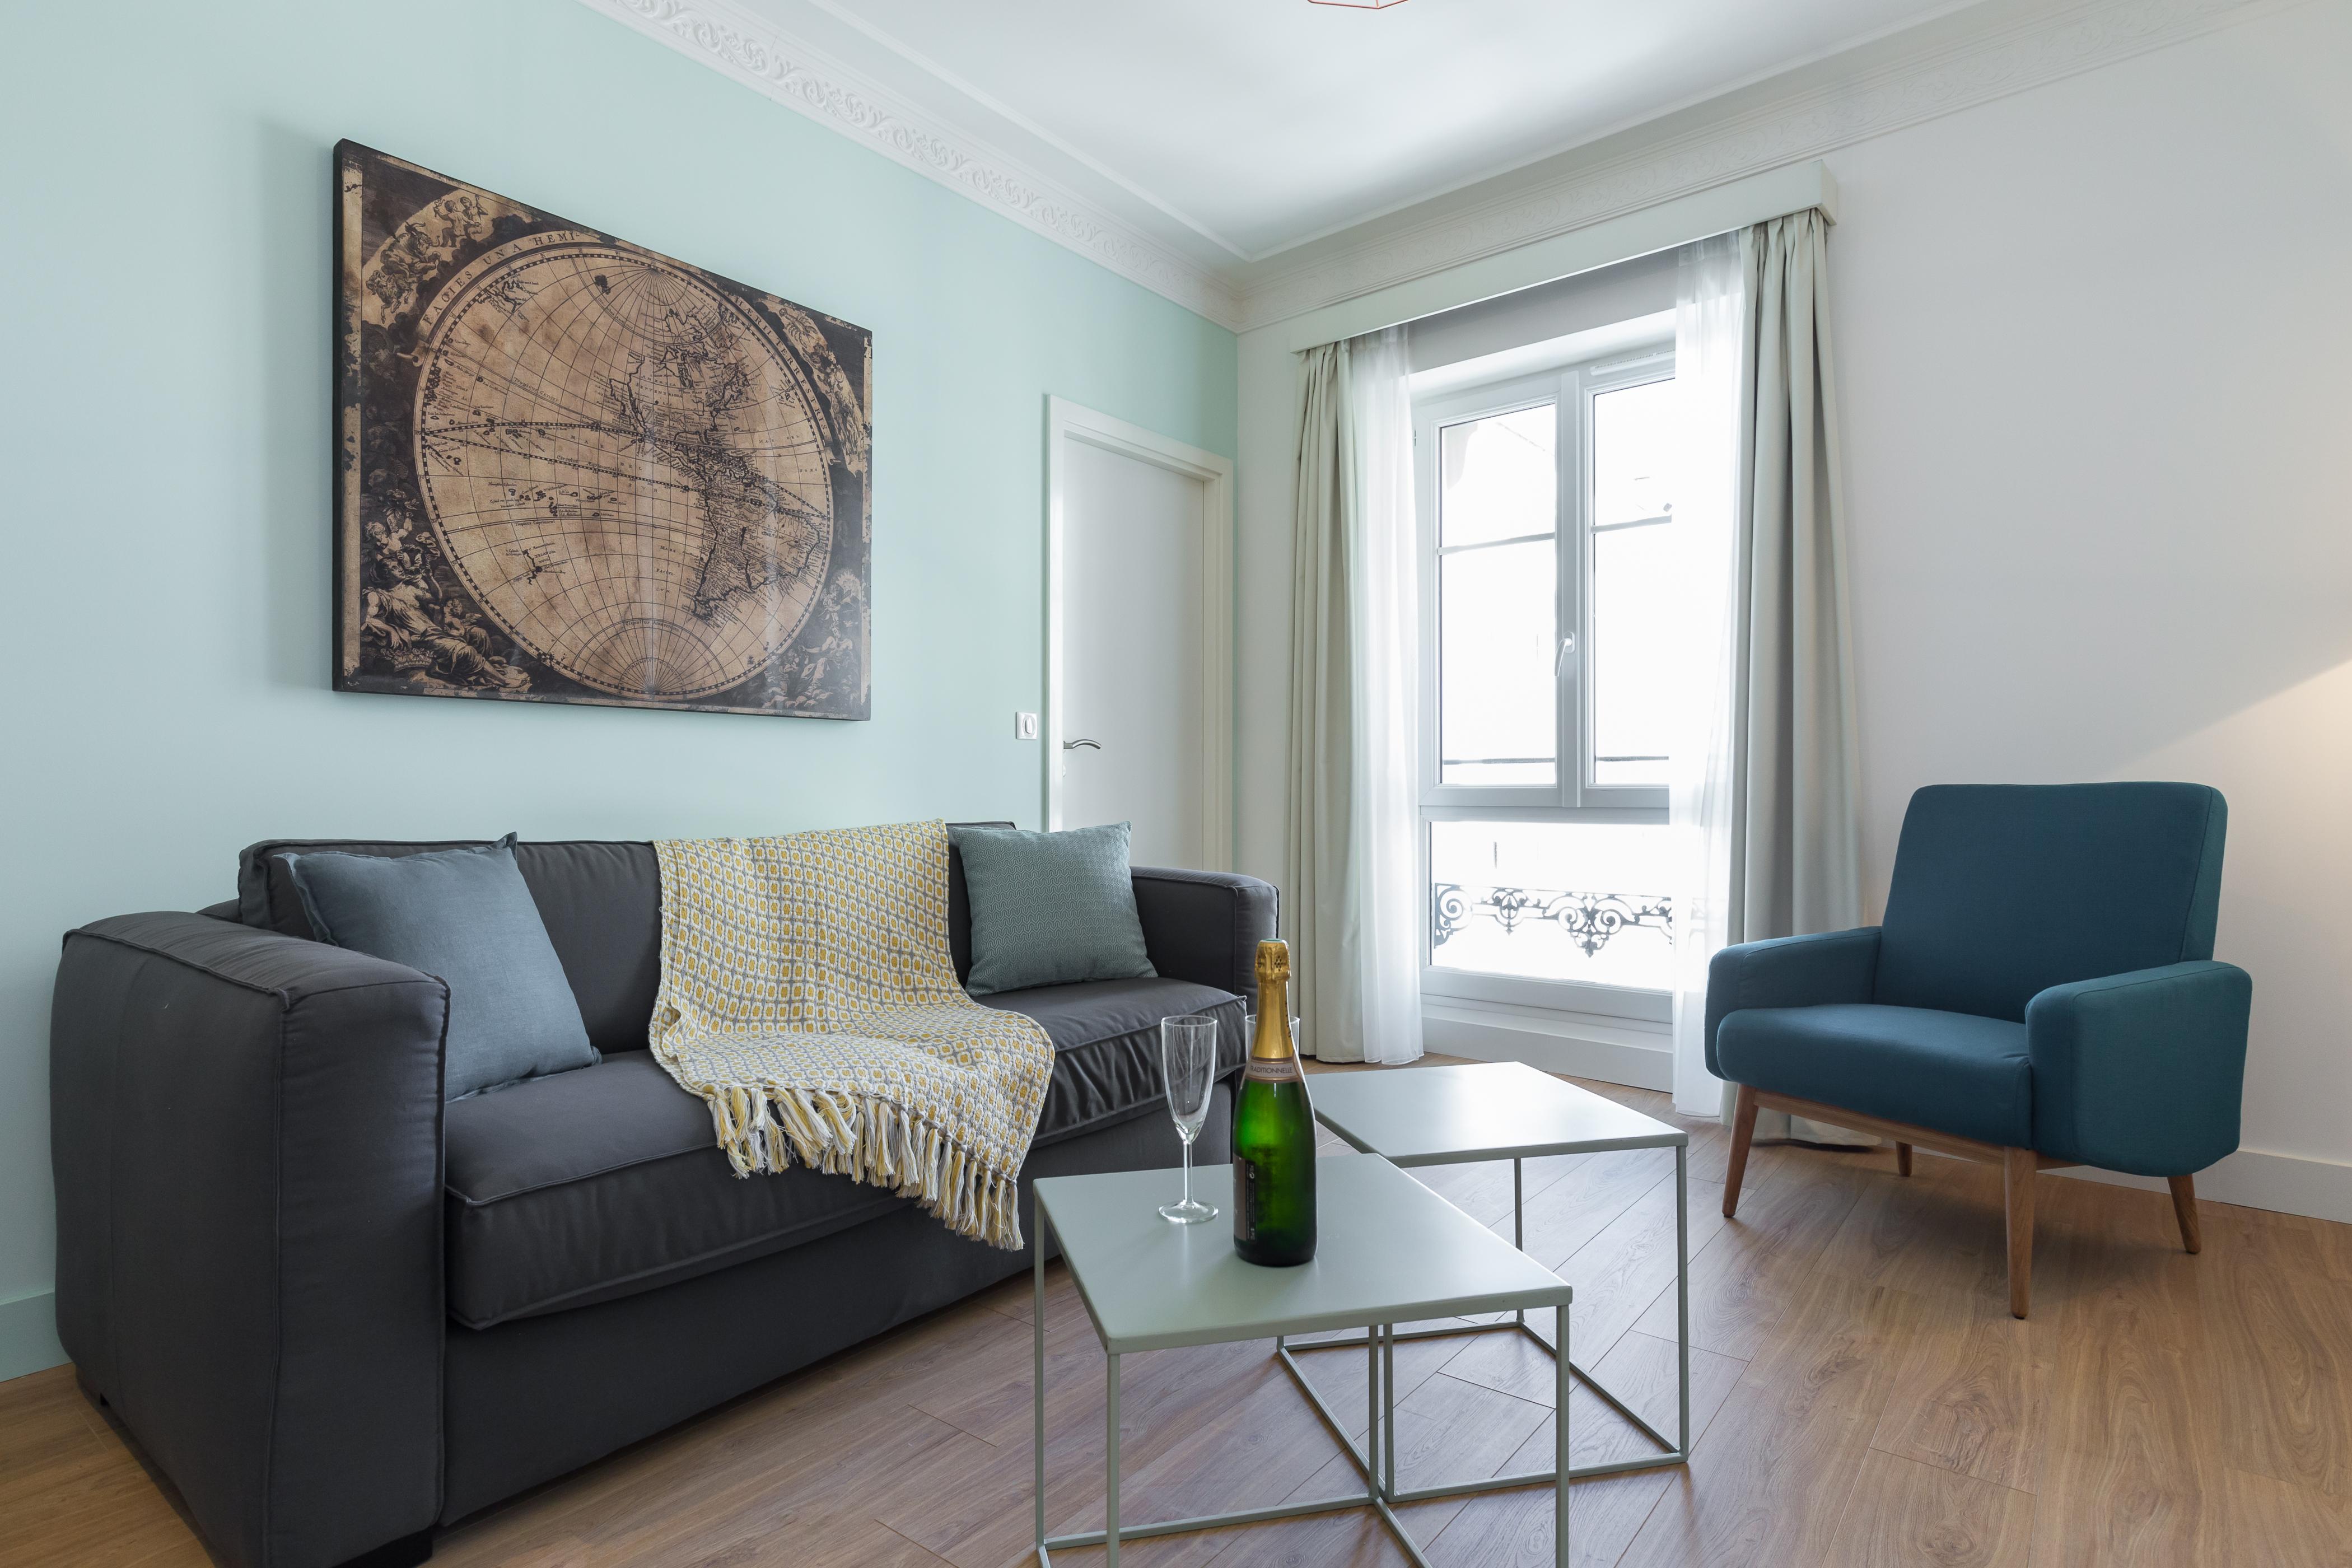 Appartement 3 pièces 55 m² - 2 bedroom apartment 55 sqm